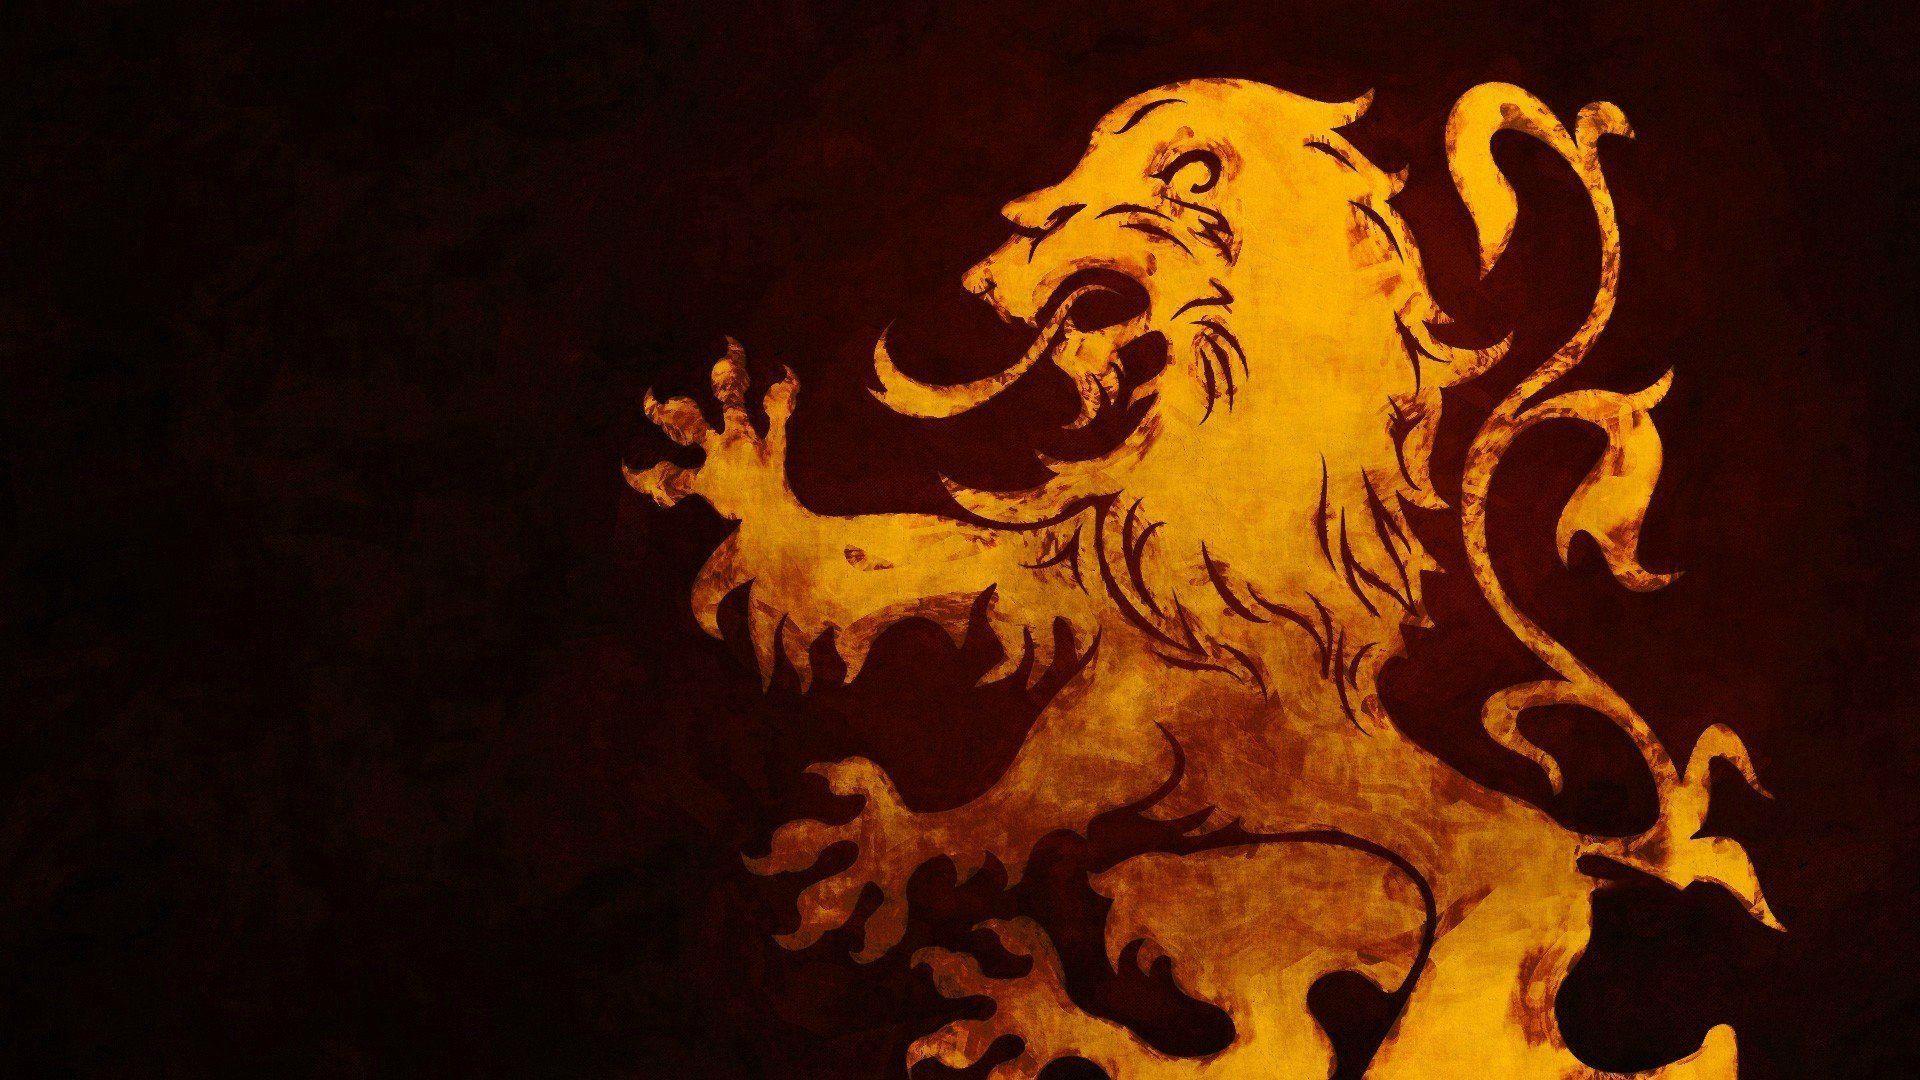 Lion Logo Wallpapers - Wallpaper Cave